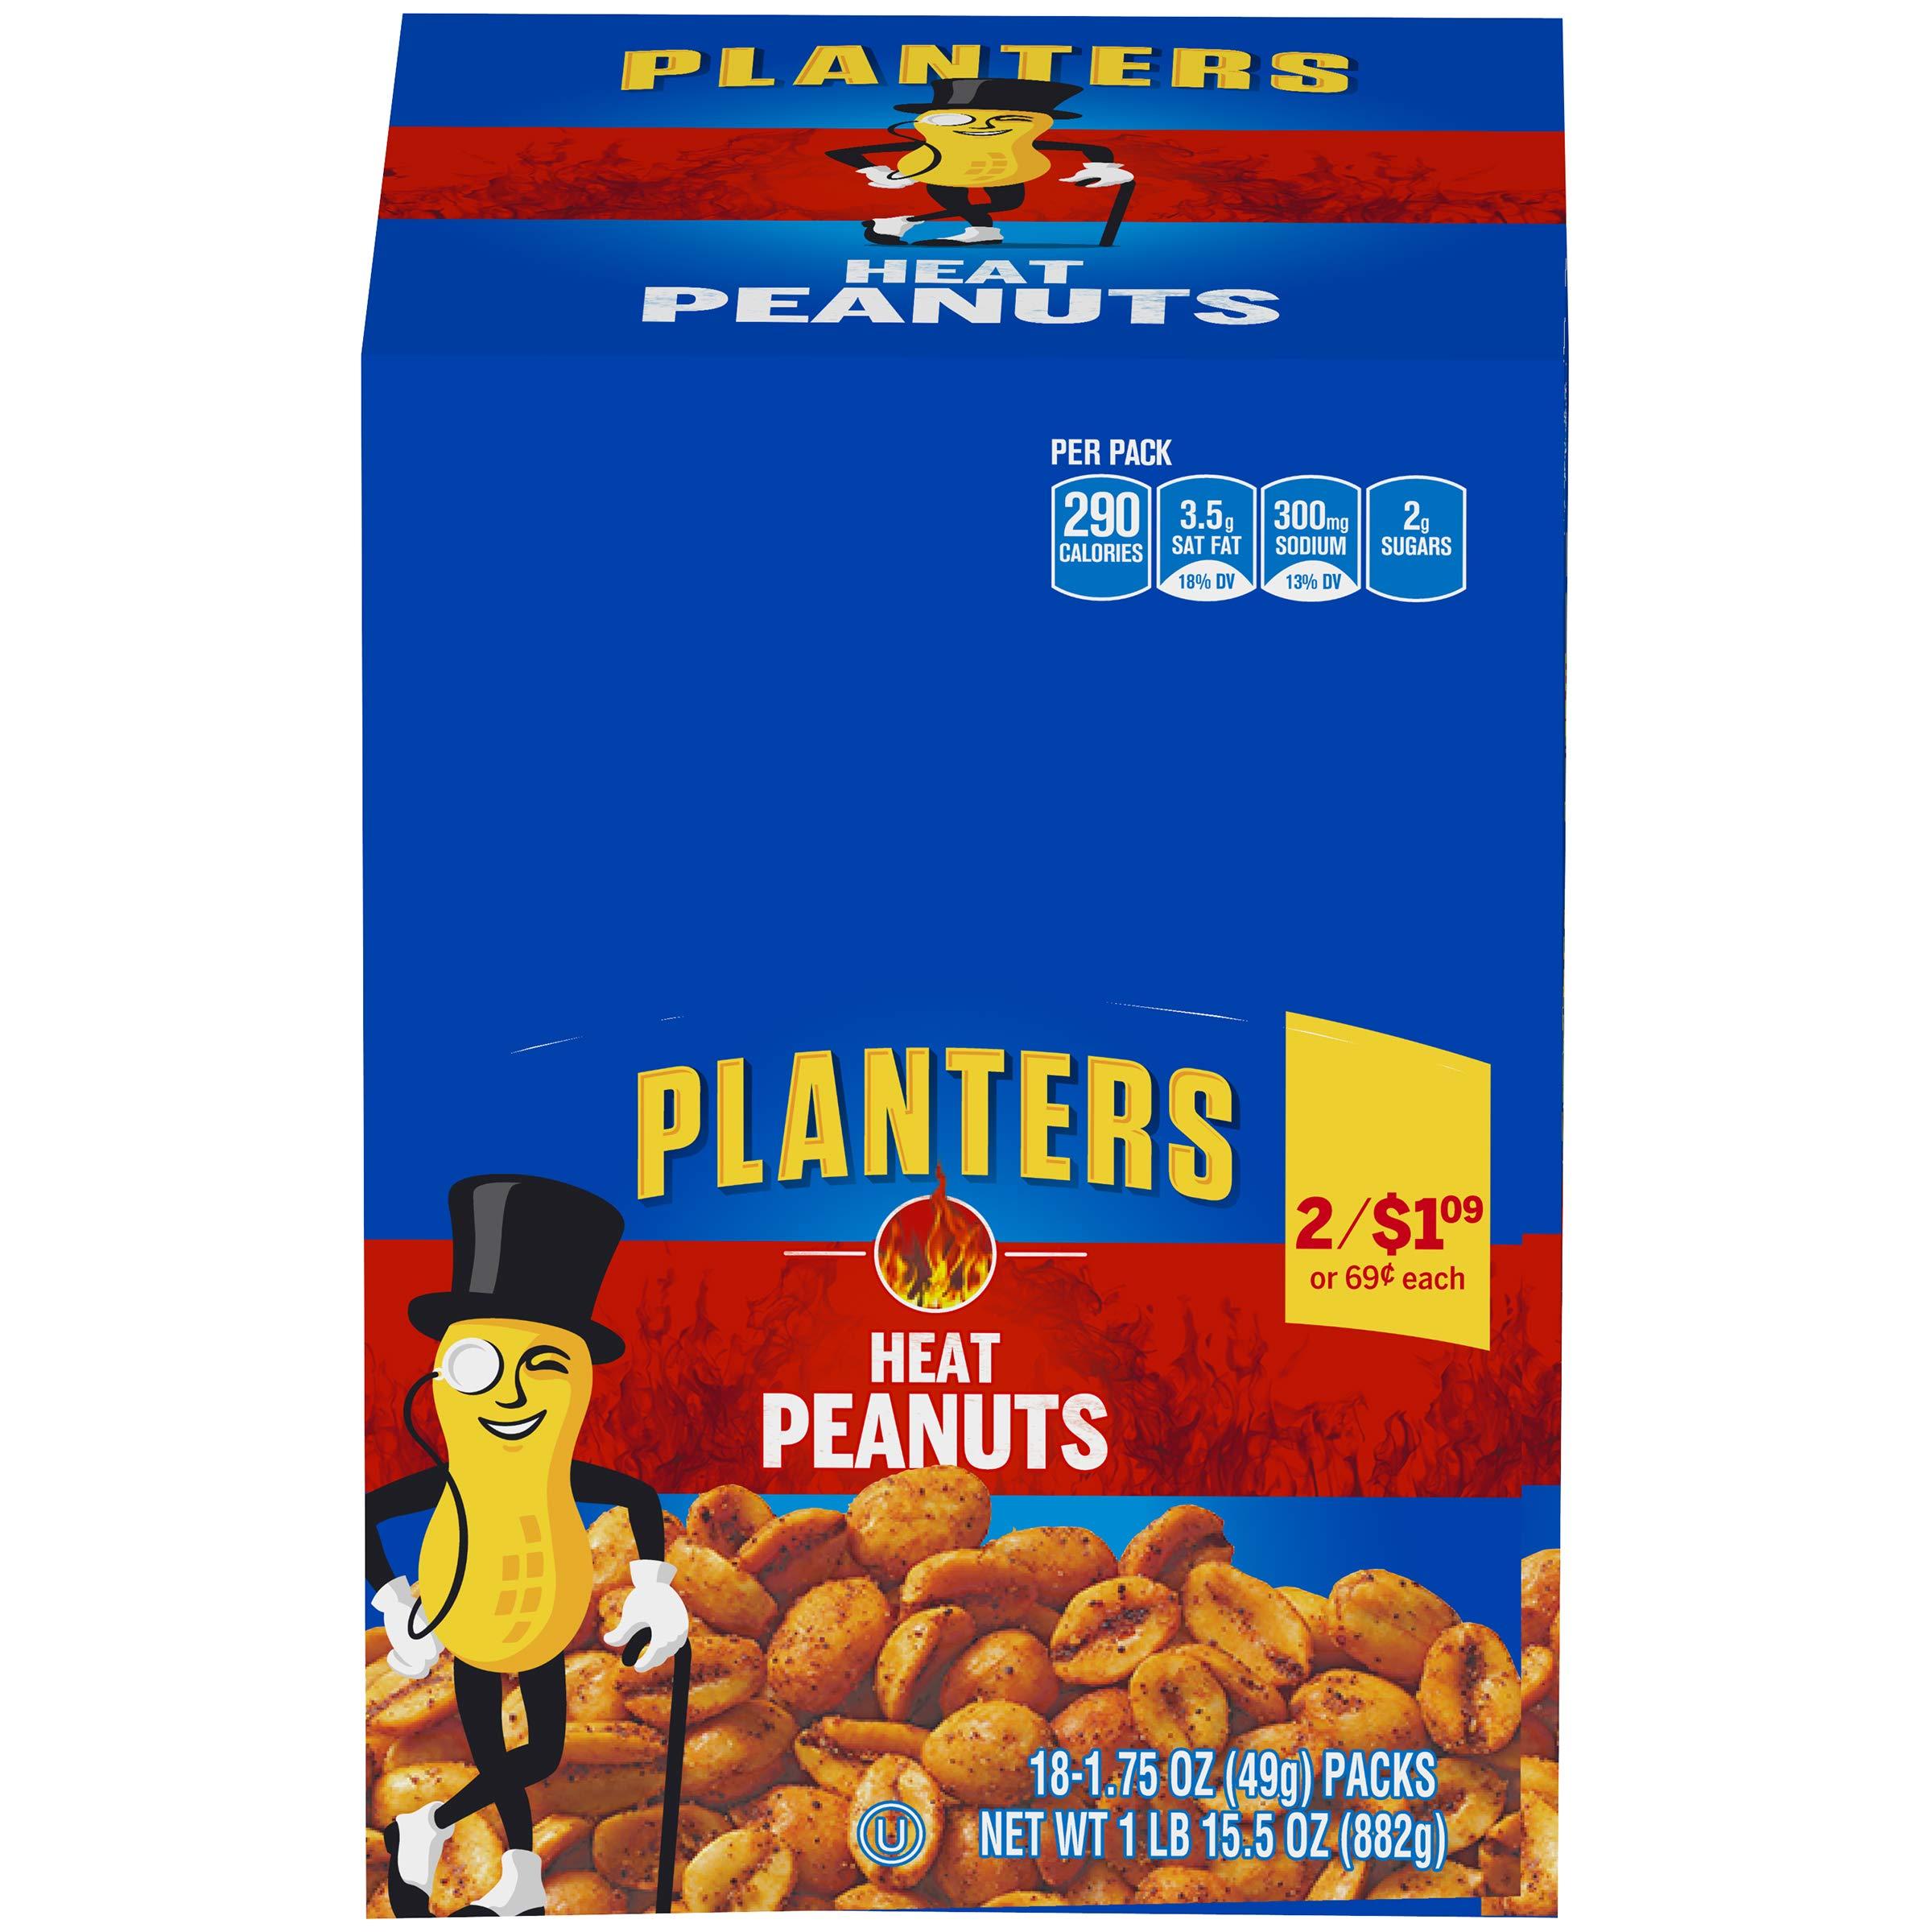 Planters Heat Peanuts (1.75 oz Bag) by Planters